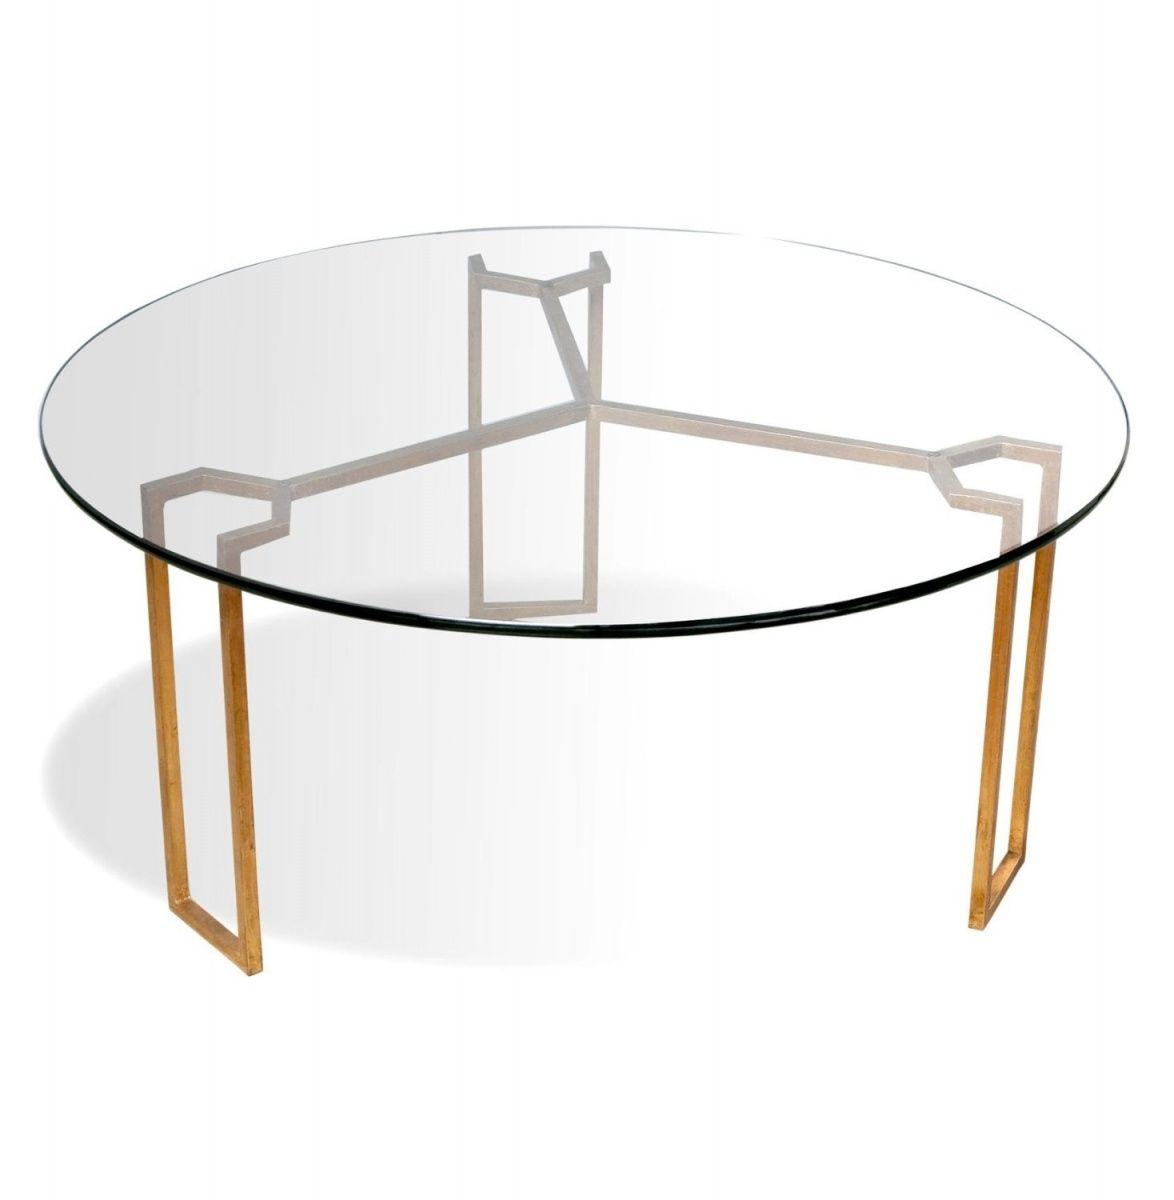 Modern Round Glass Coffee Table Modern Italian Furniture Check More At Http Www Nikkitsfun Com Modern Round Glass Coffee Table [ jpg ]